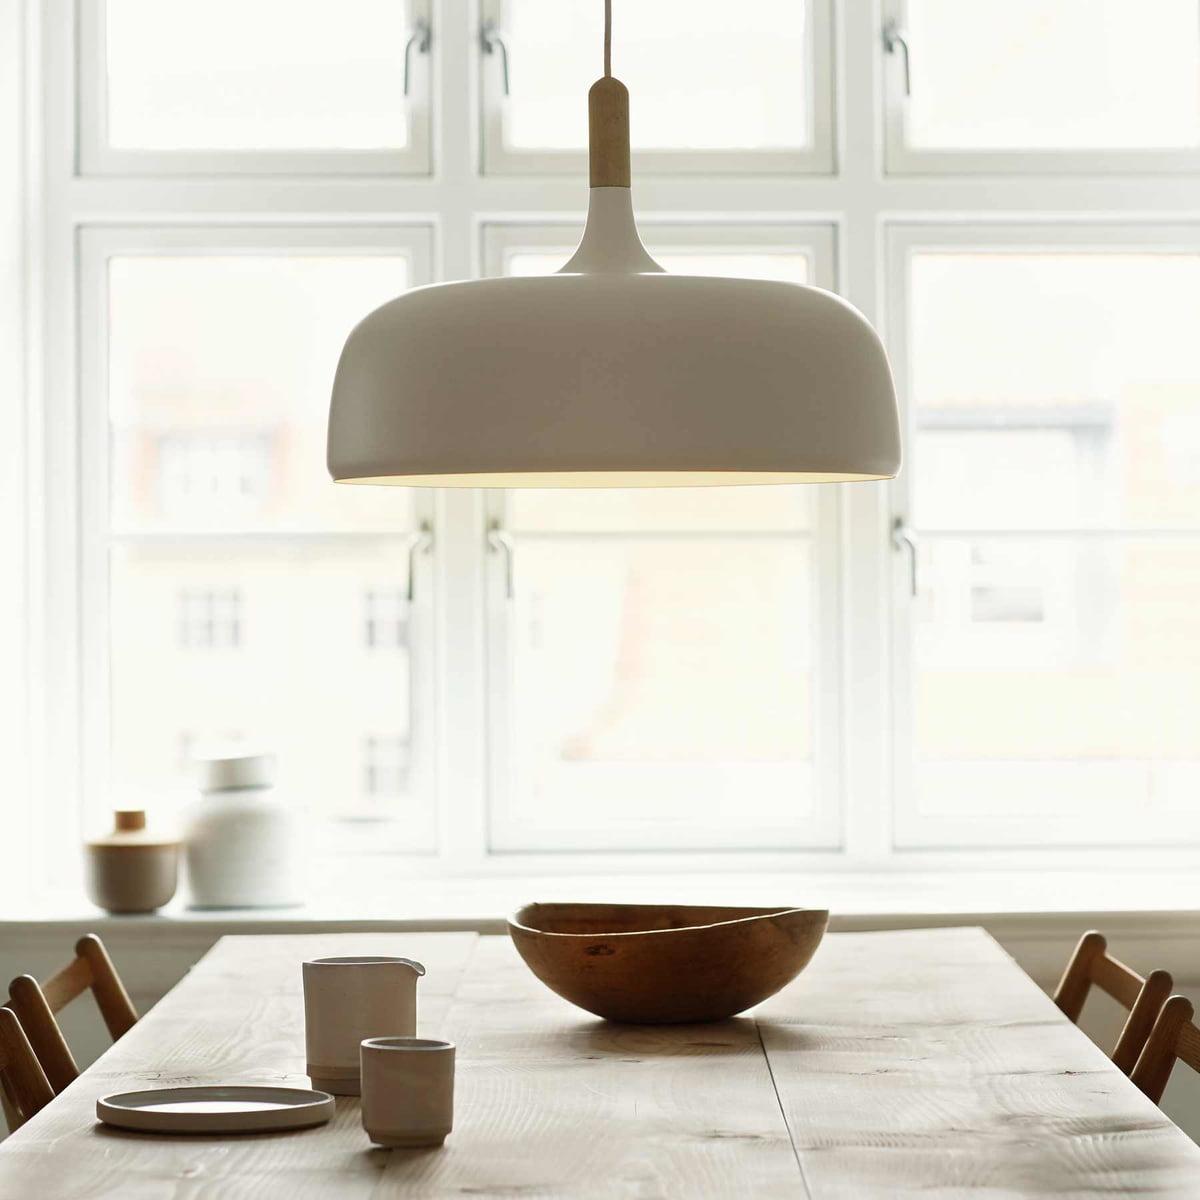 Acorn bathroom furniture - The Acorn Pendant Lamp By Northernlighting In White